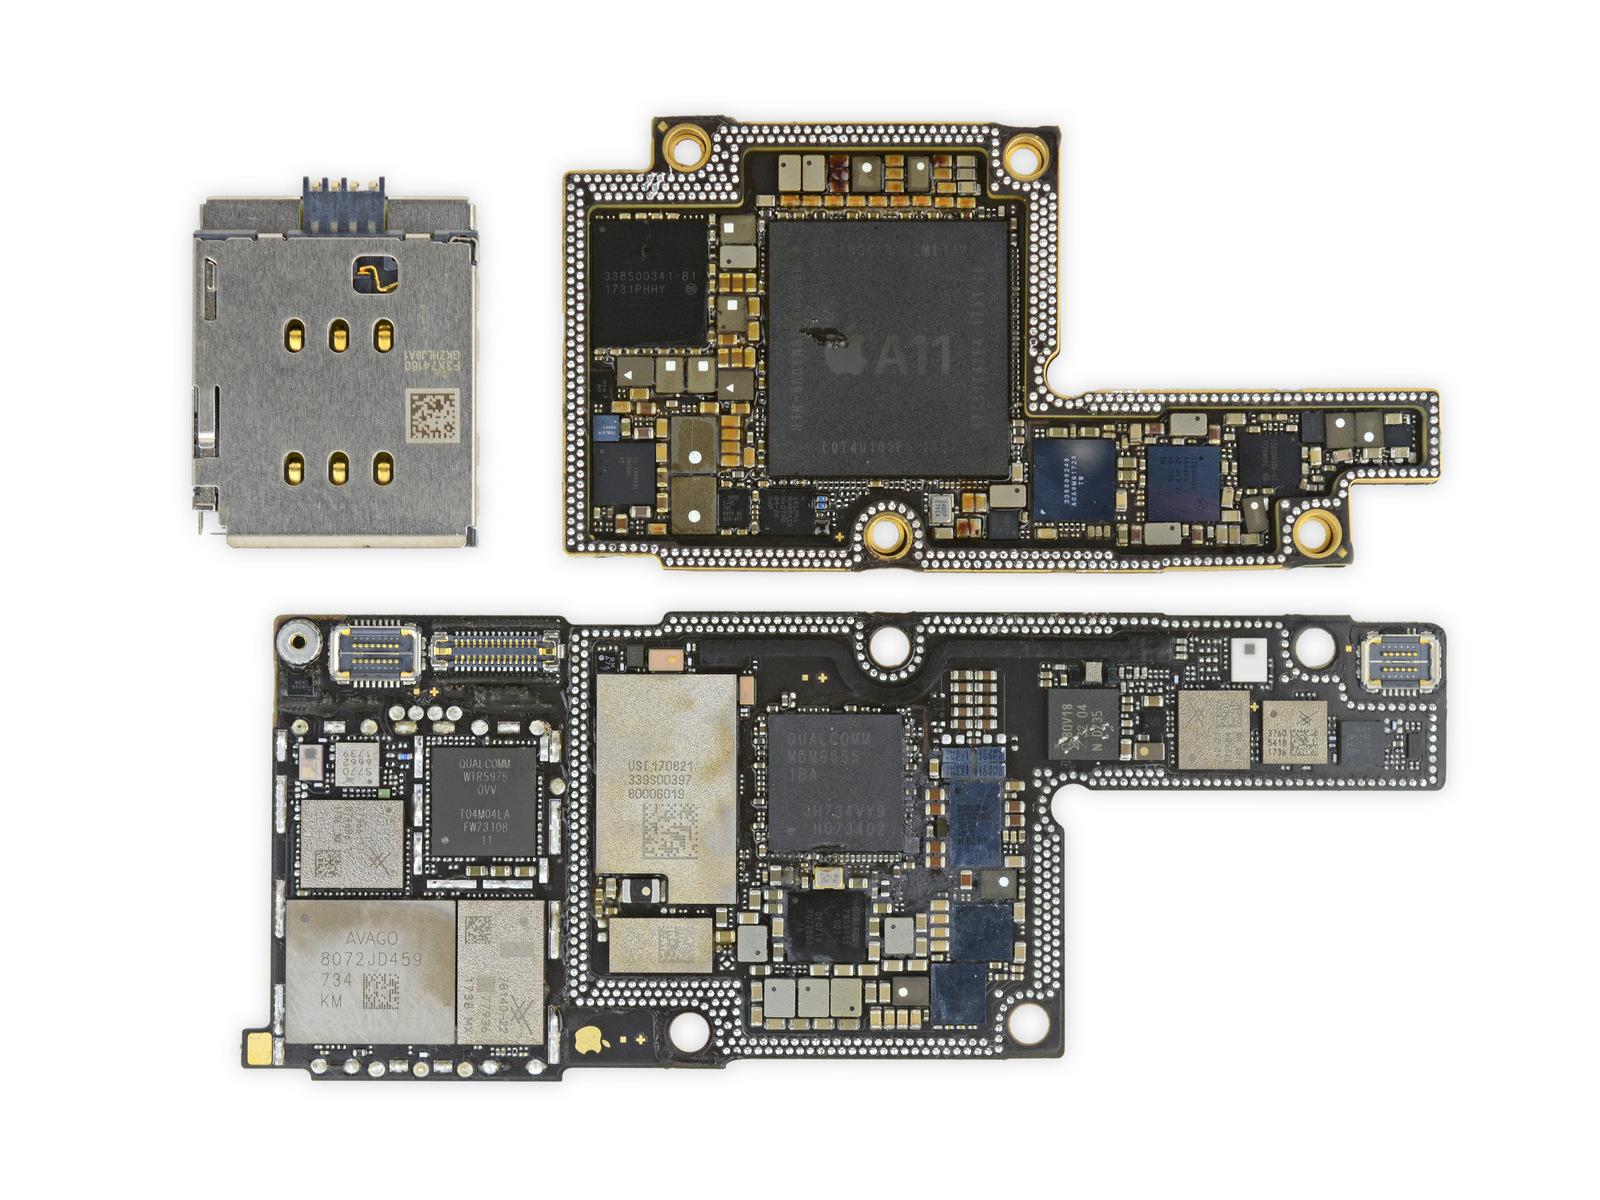 iPhone X получил 6 баллов от iFixit по шкале ремонтопригодности - 2